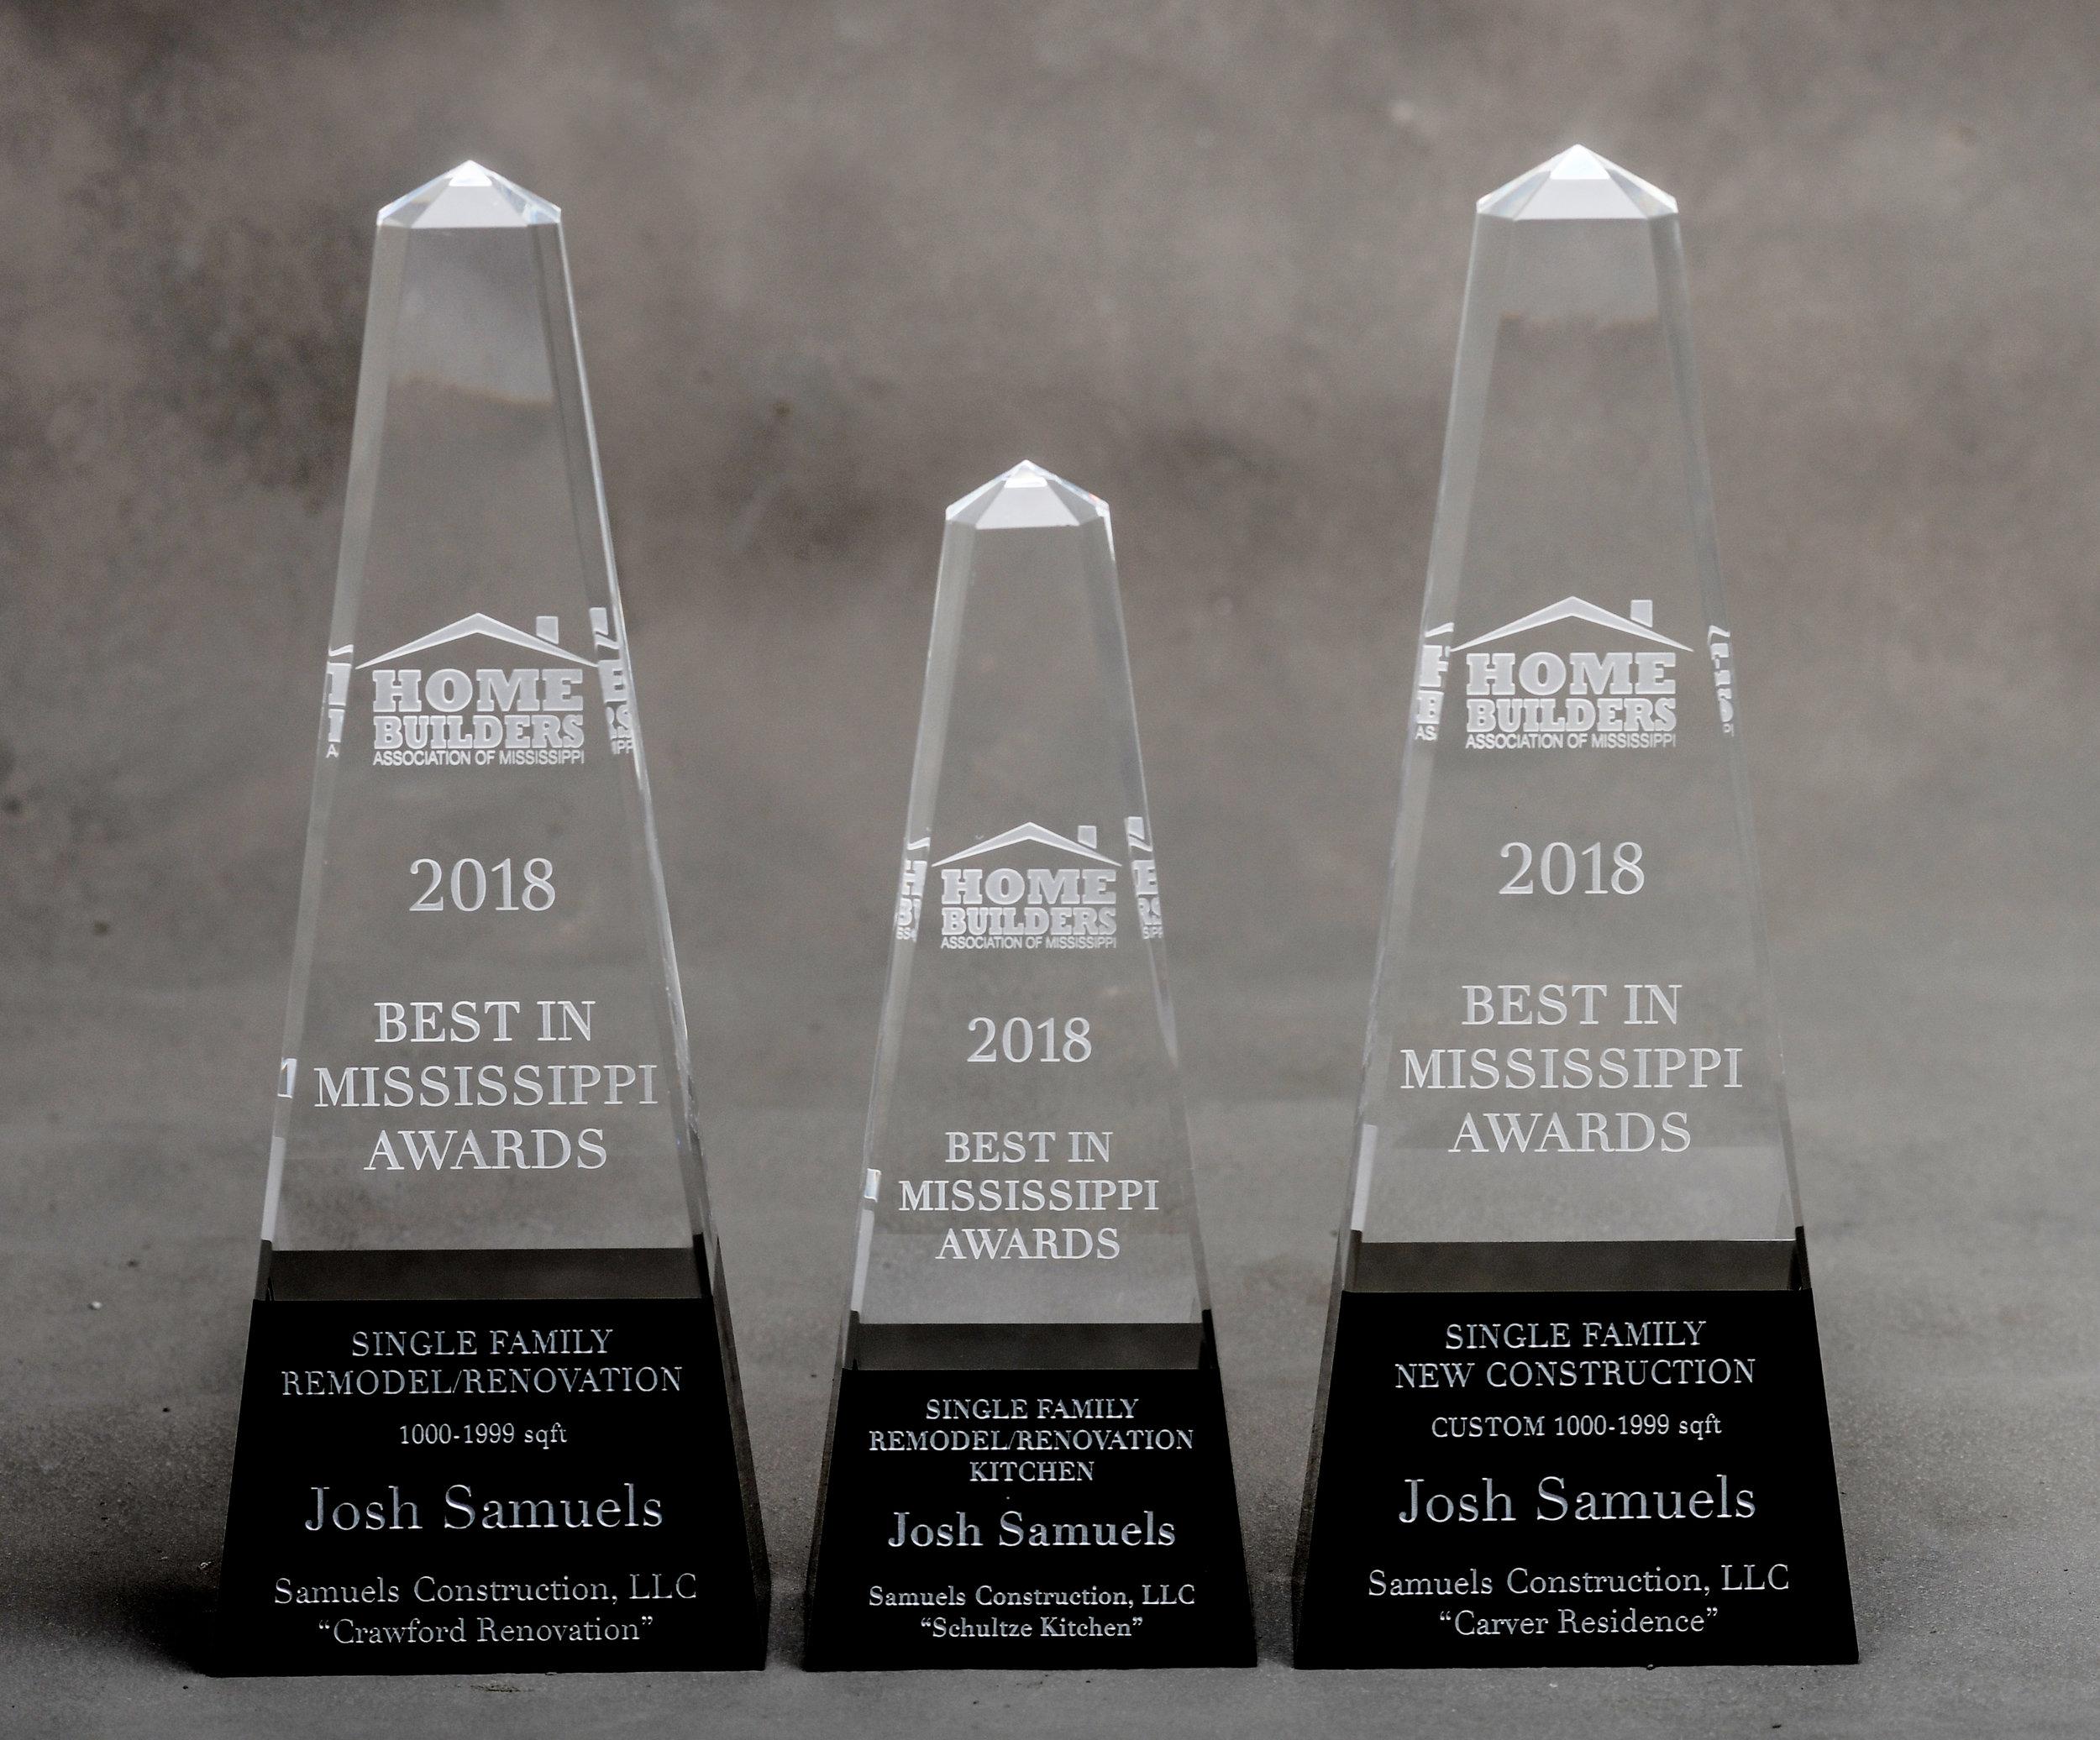 2018 Best in Mississippi Awards - WINNER:-Best Single Family Mid-Size Remodel -Best Single Family Kitchen Renovation-Best Mid-Size New Construction Custom Home